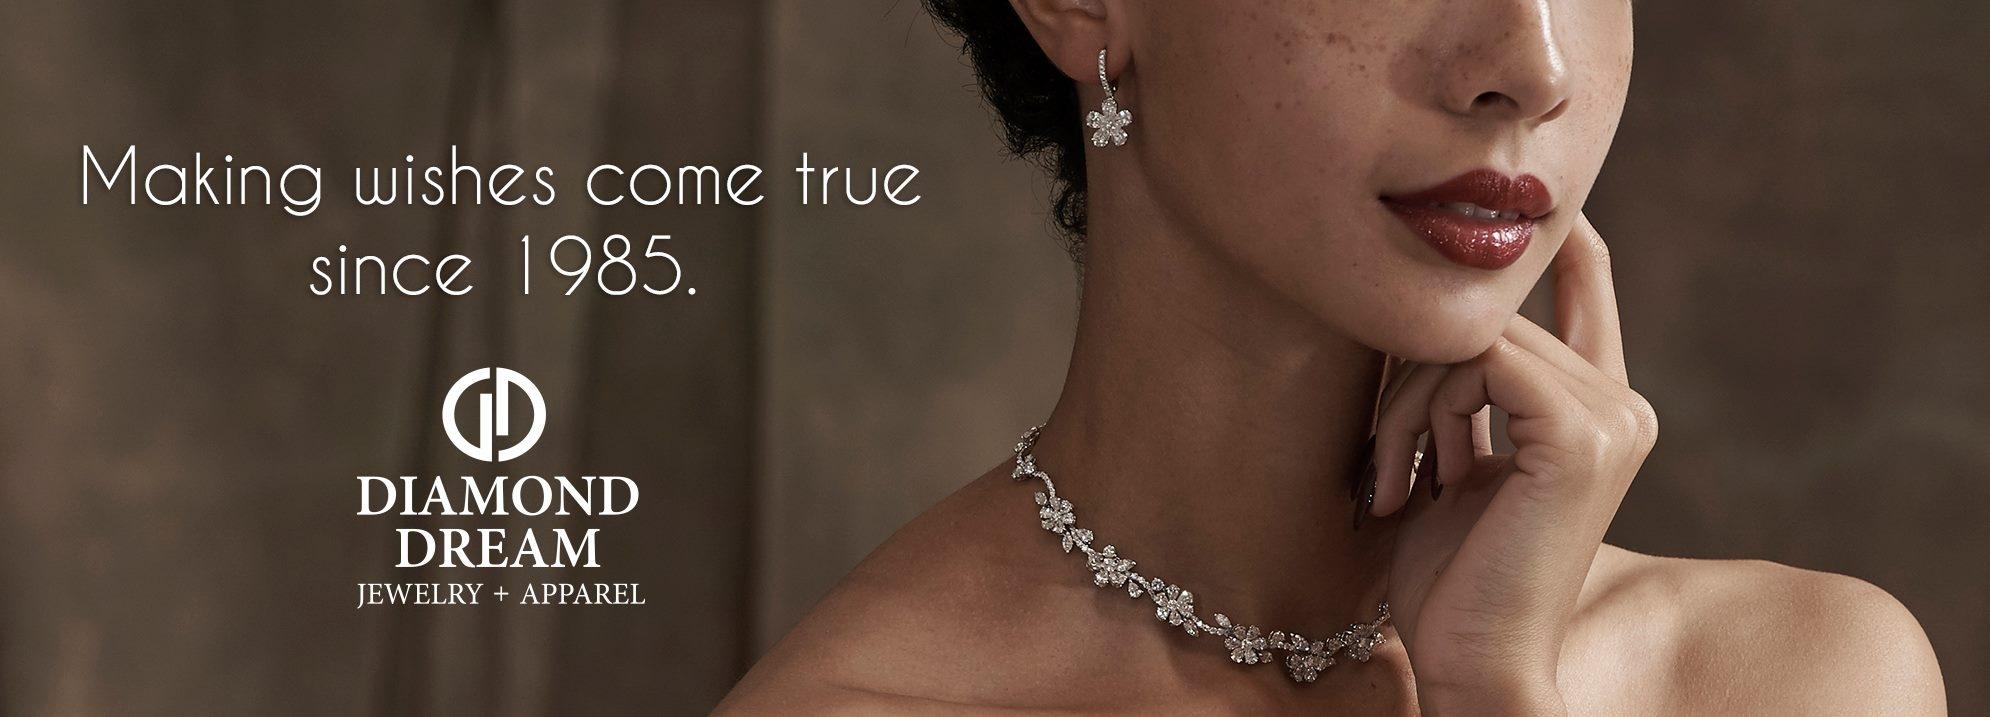 DIAMOND DREAM JEWELRY & APPAREL (@diamonddreamjewelers) Cover Image